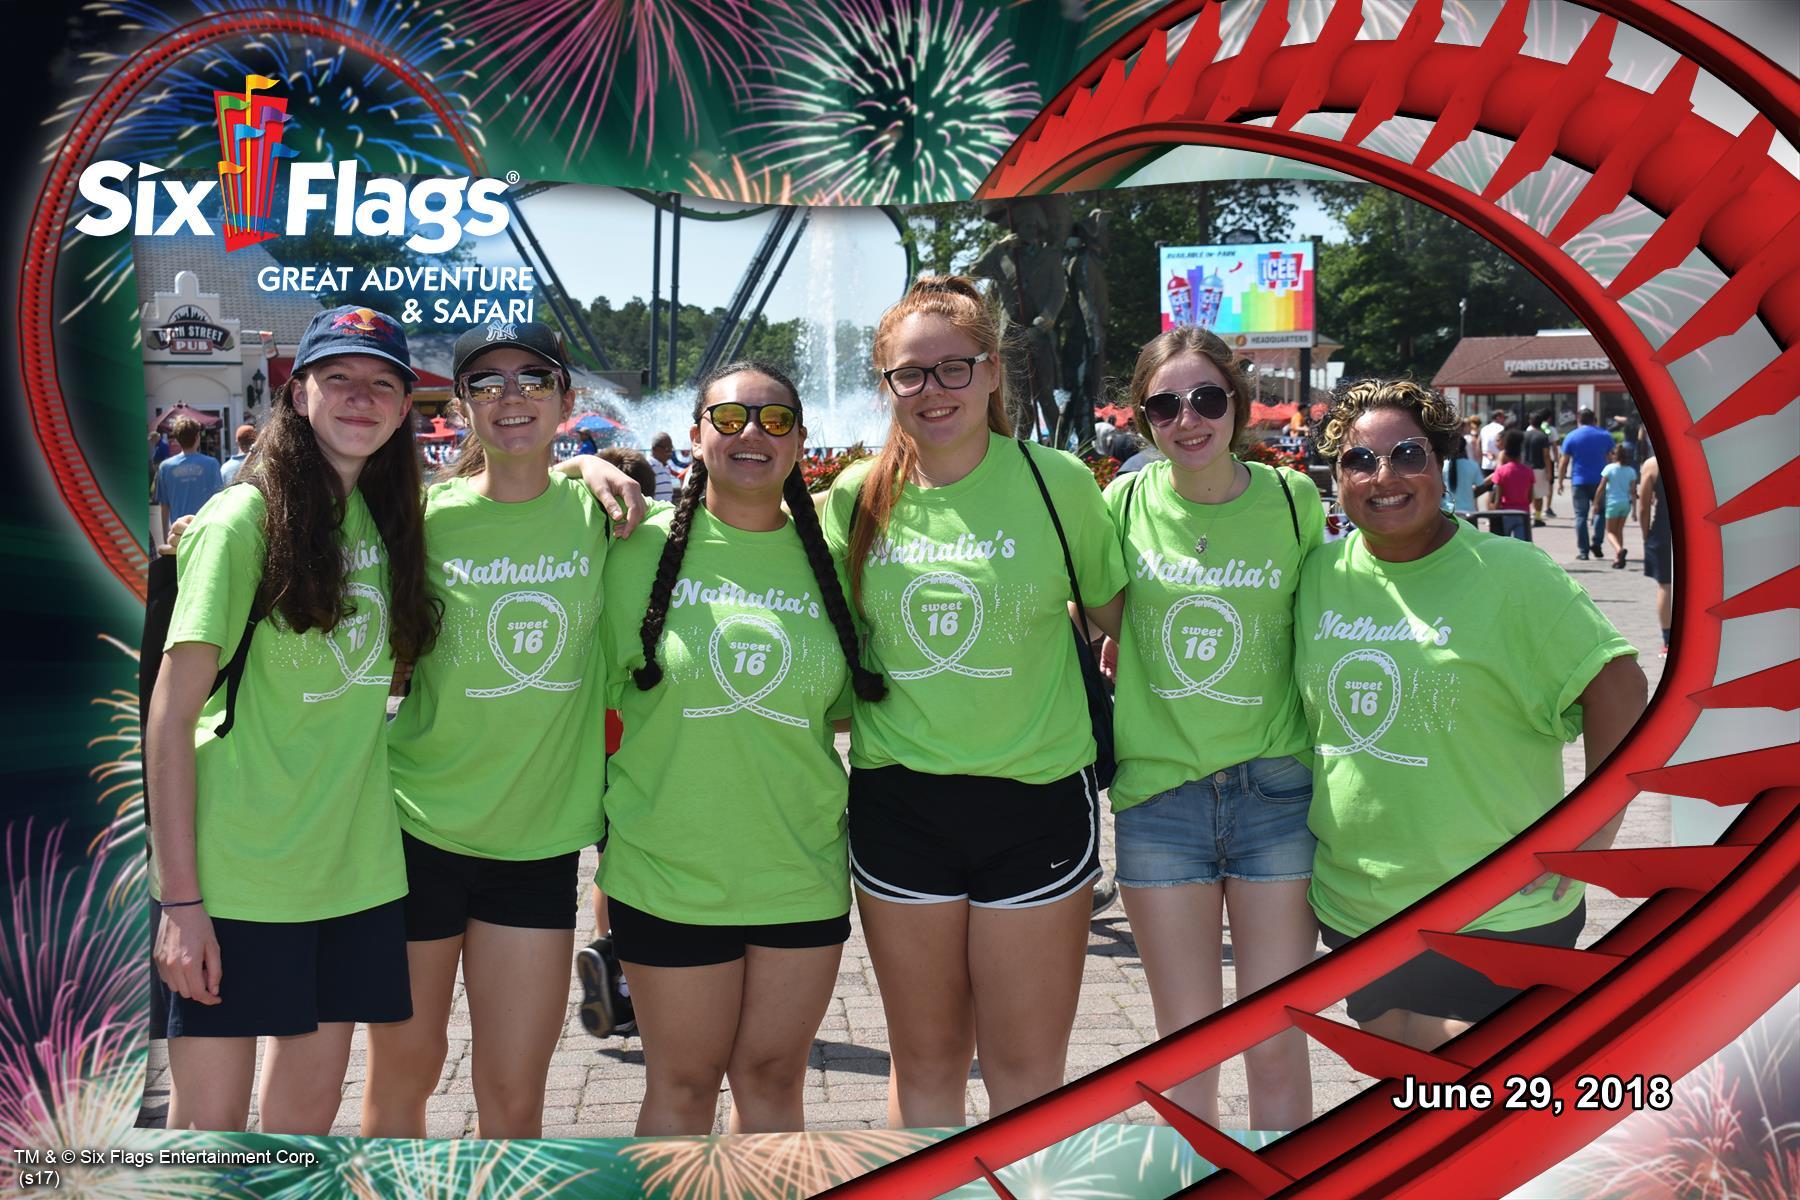 Custom T Shirts For Six Flags Sweet 16 Shirt Design Ideas